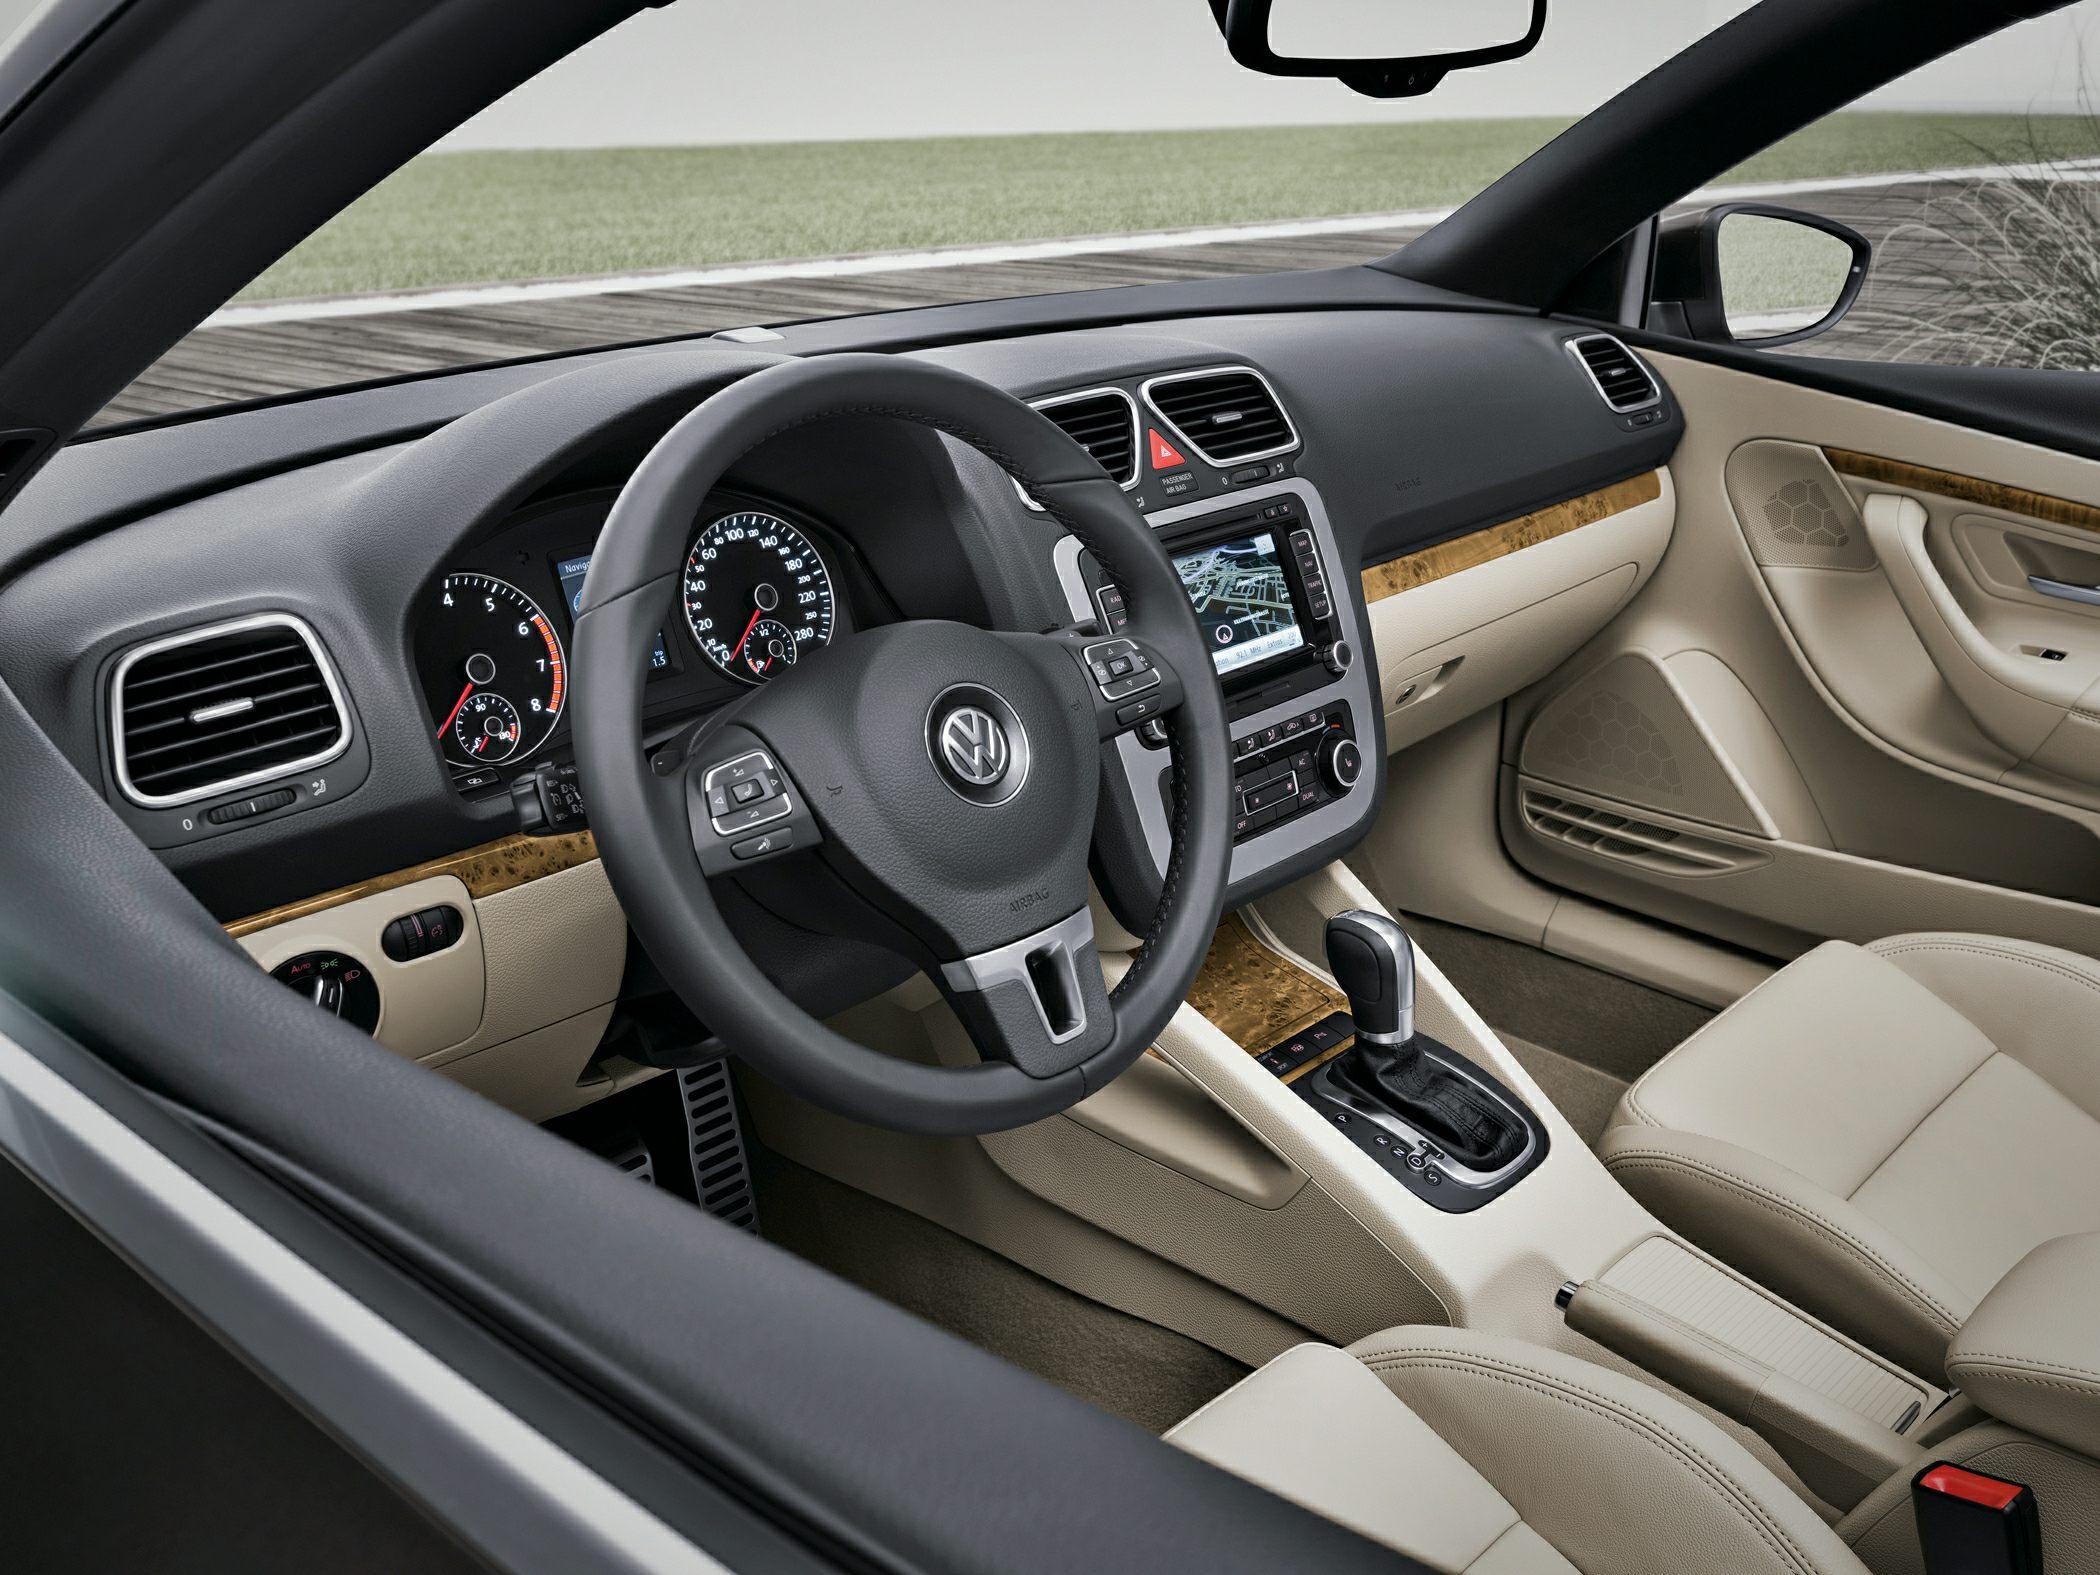 2014 Volkswagen Eos Interior Irvine CA